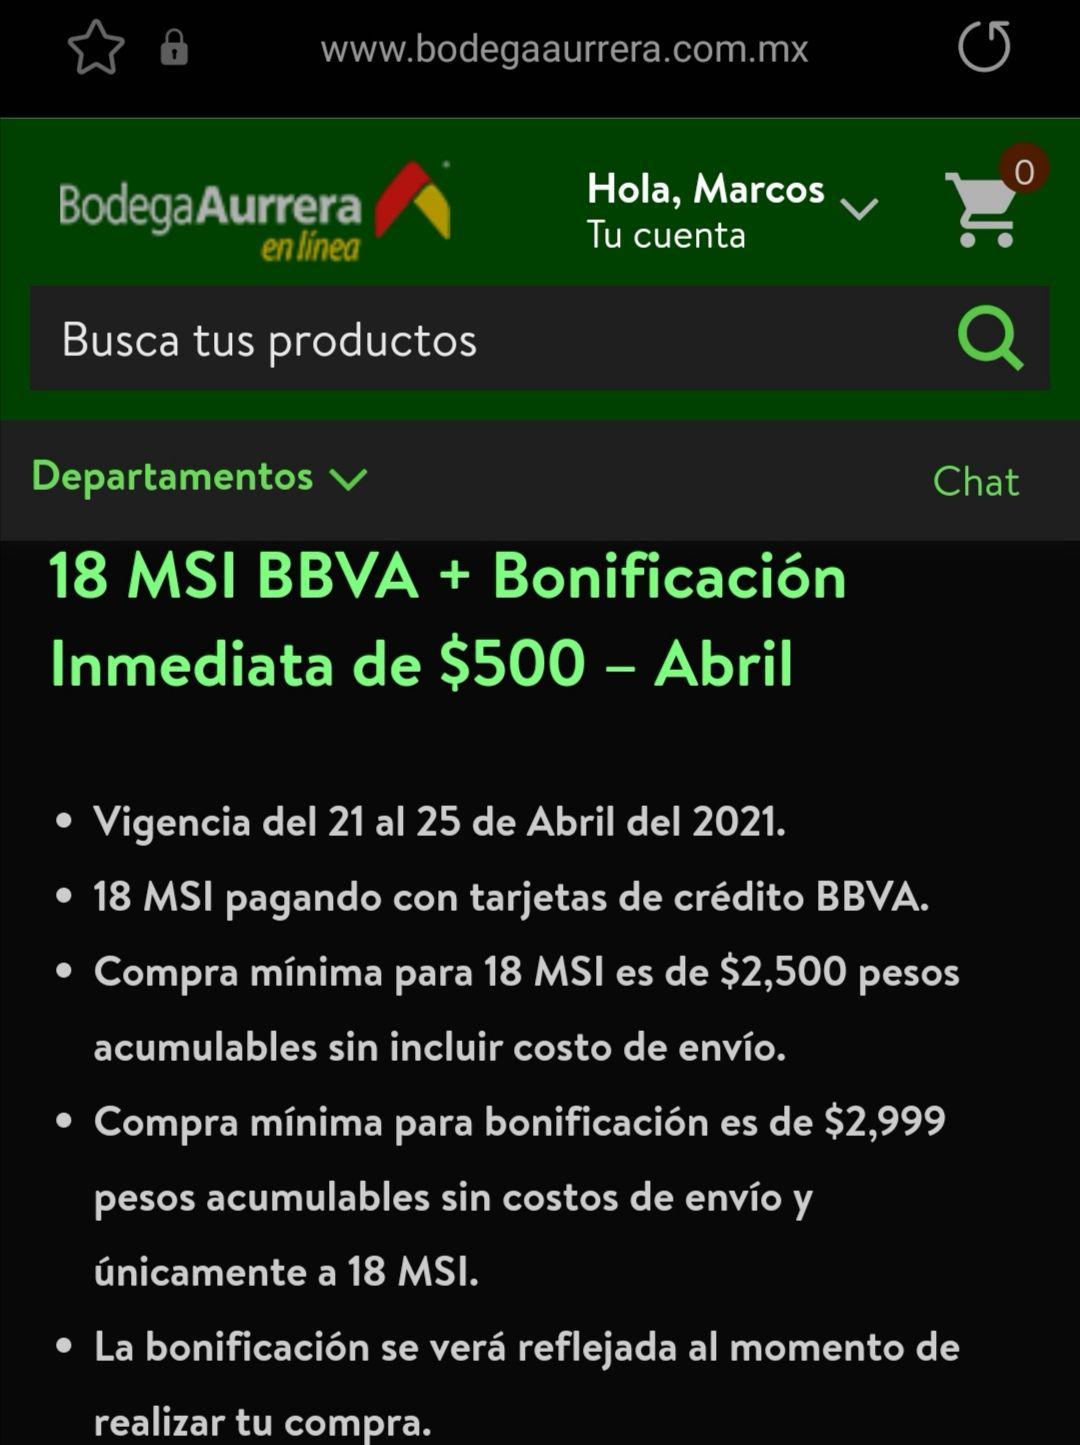 Bodega Aurrera y Walmart : Bonificación $500 BBVA 18 msi, acumulable a 10% días BBVA